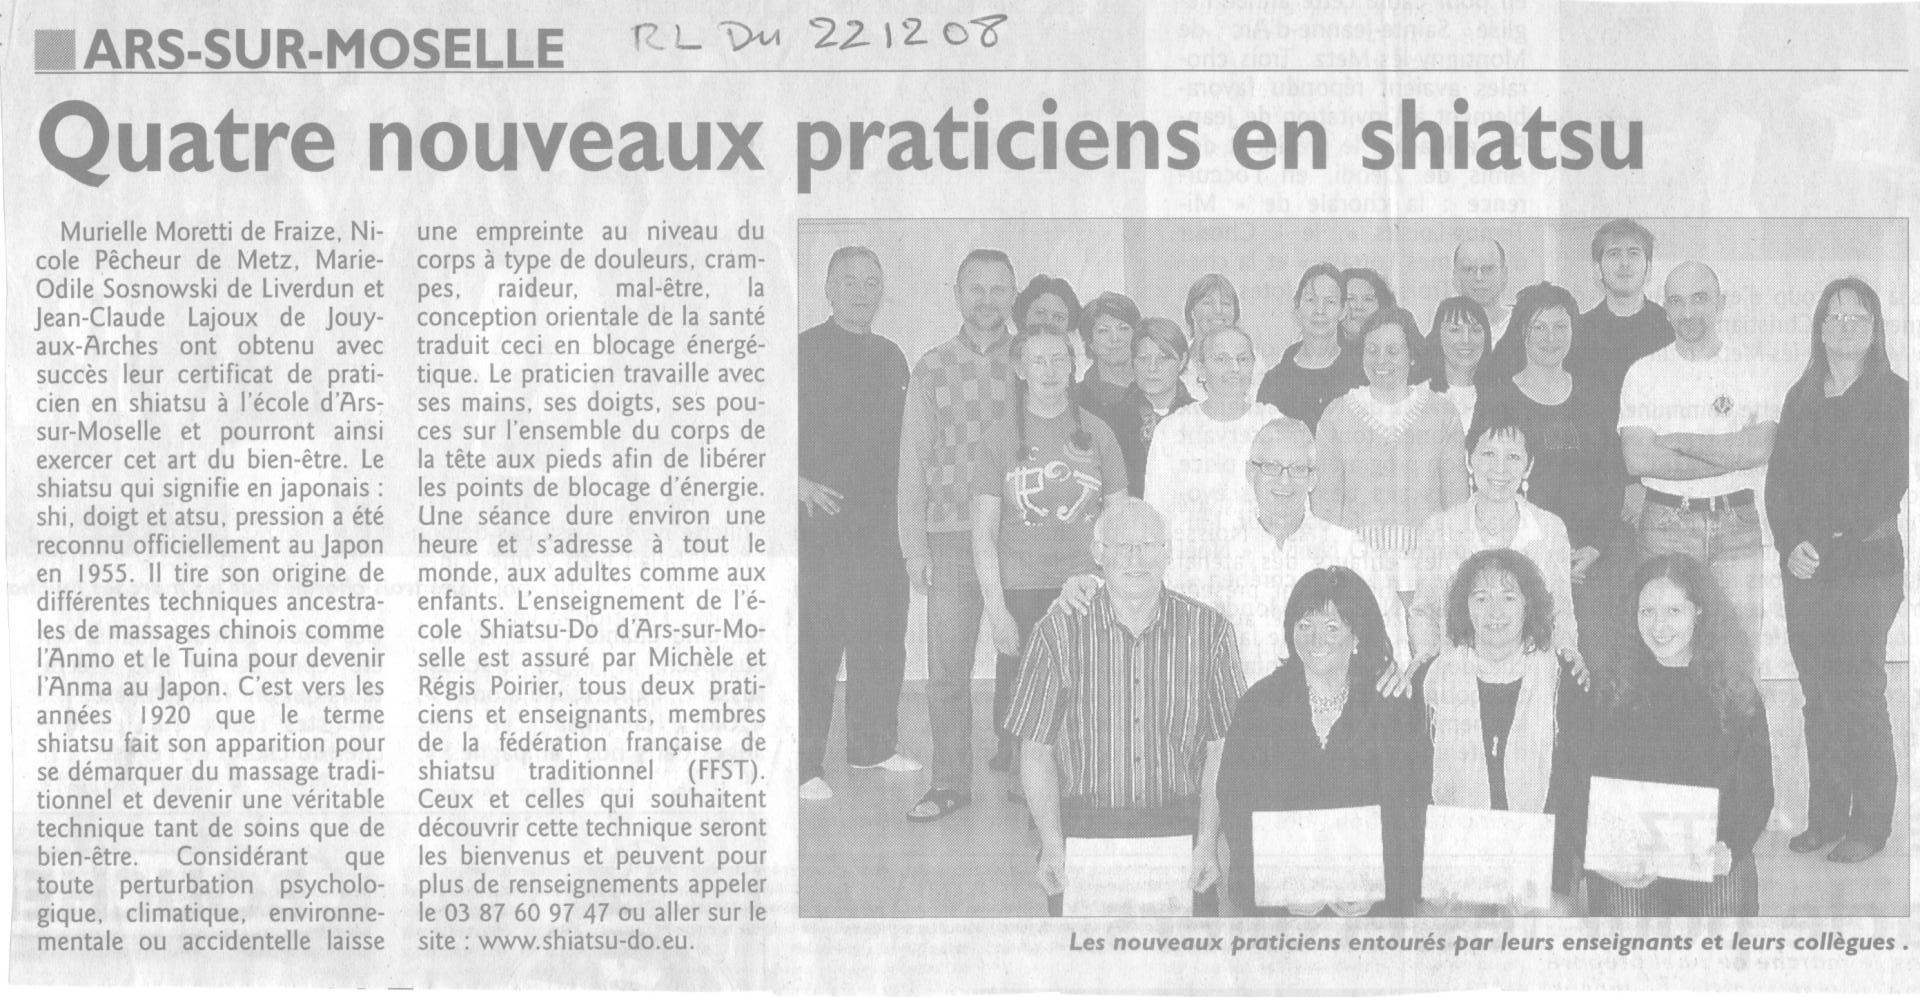 Praticiens certifiés en 2008